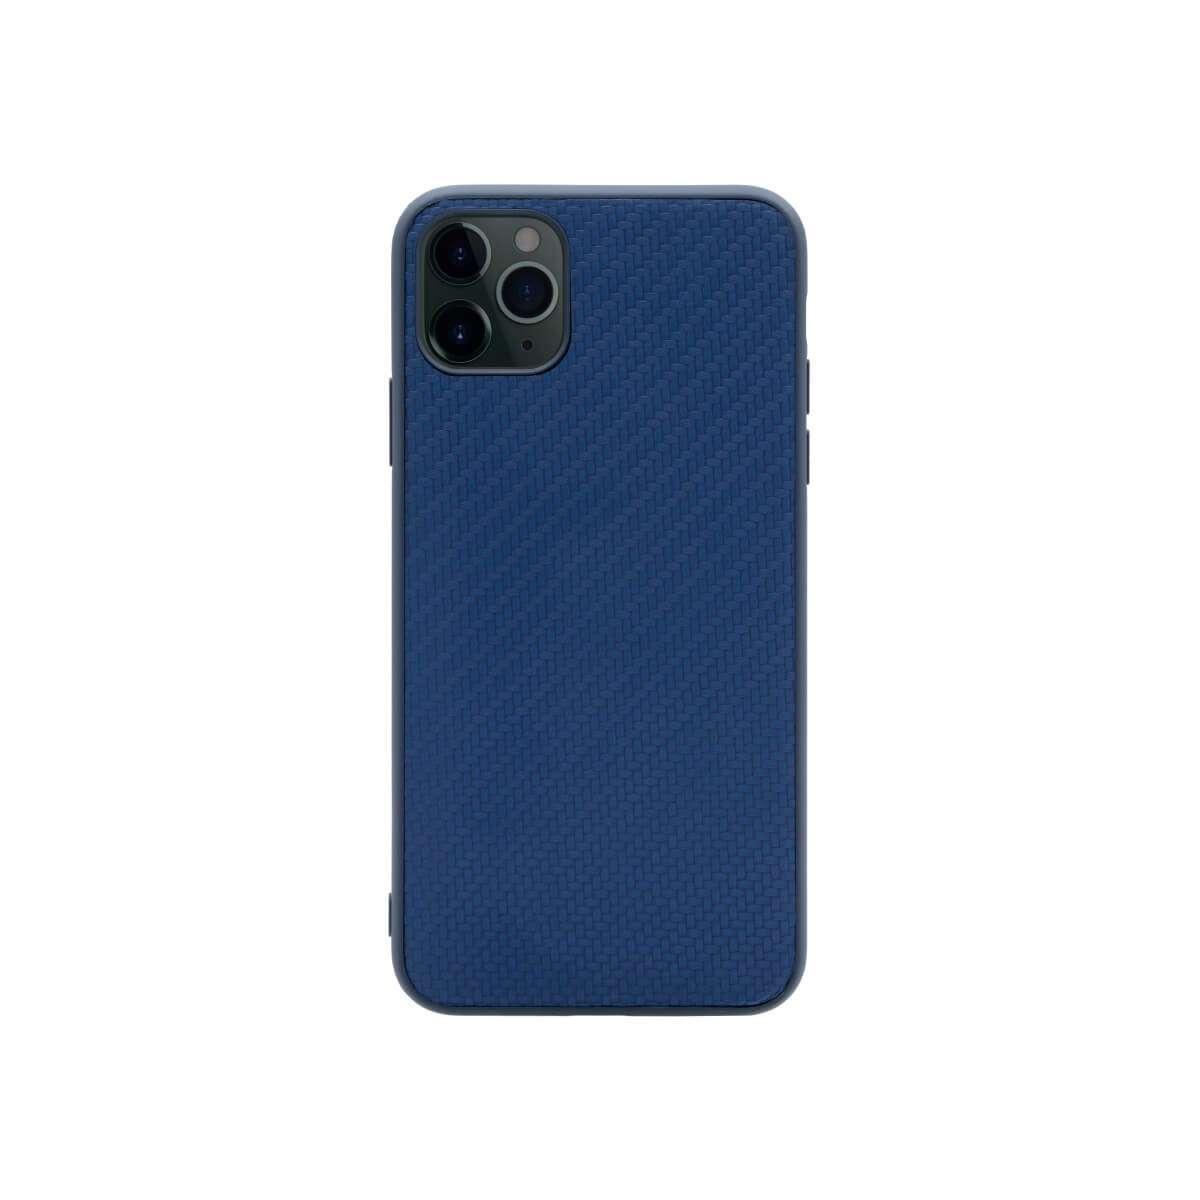 Porodo TPU Carbon Design Case For iPhone 11 Pro Max - Blue